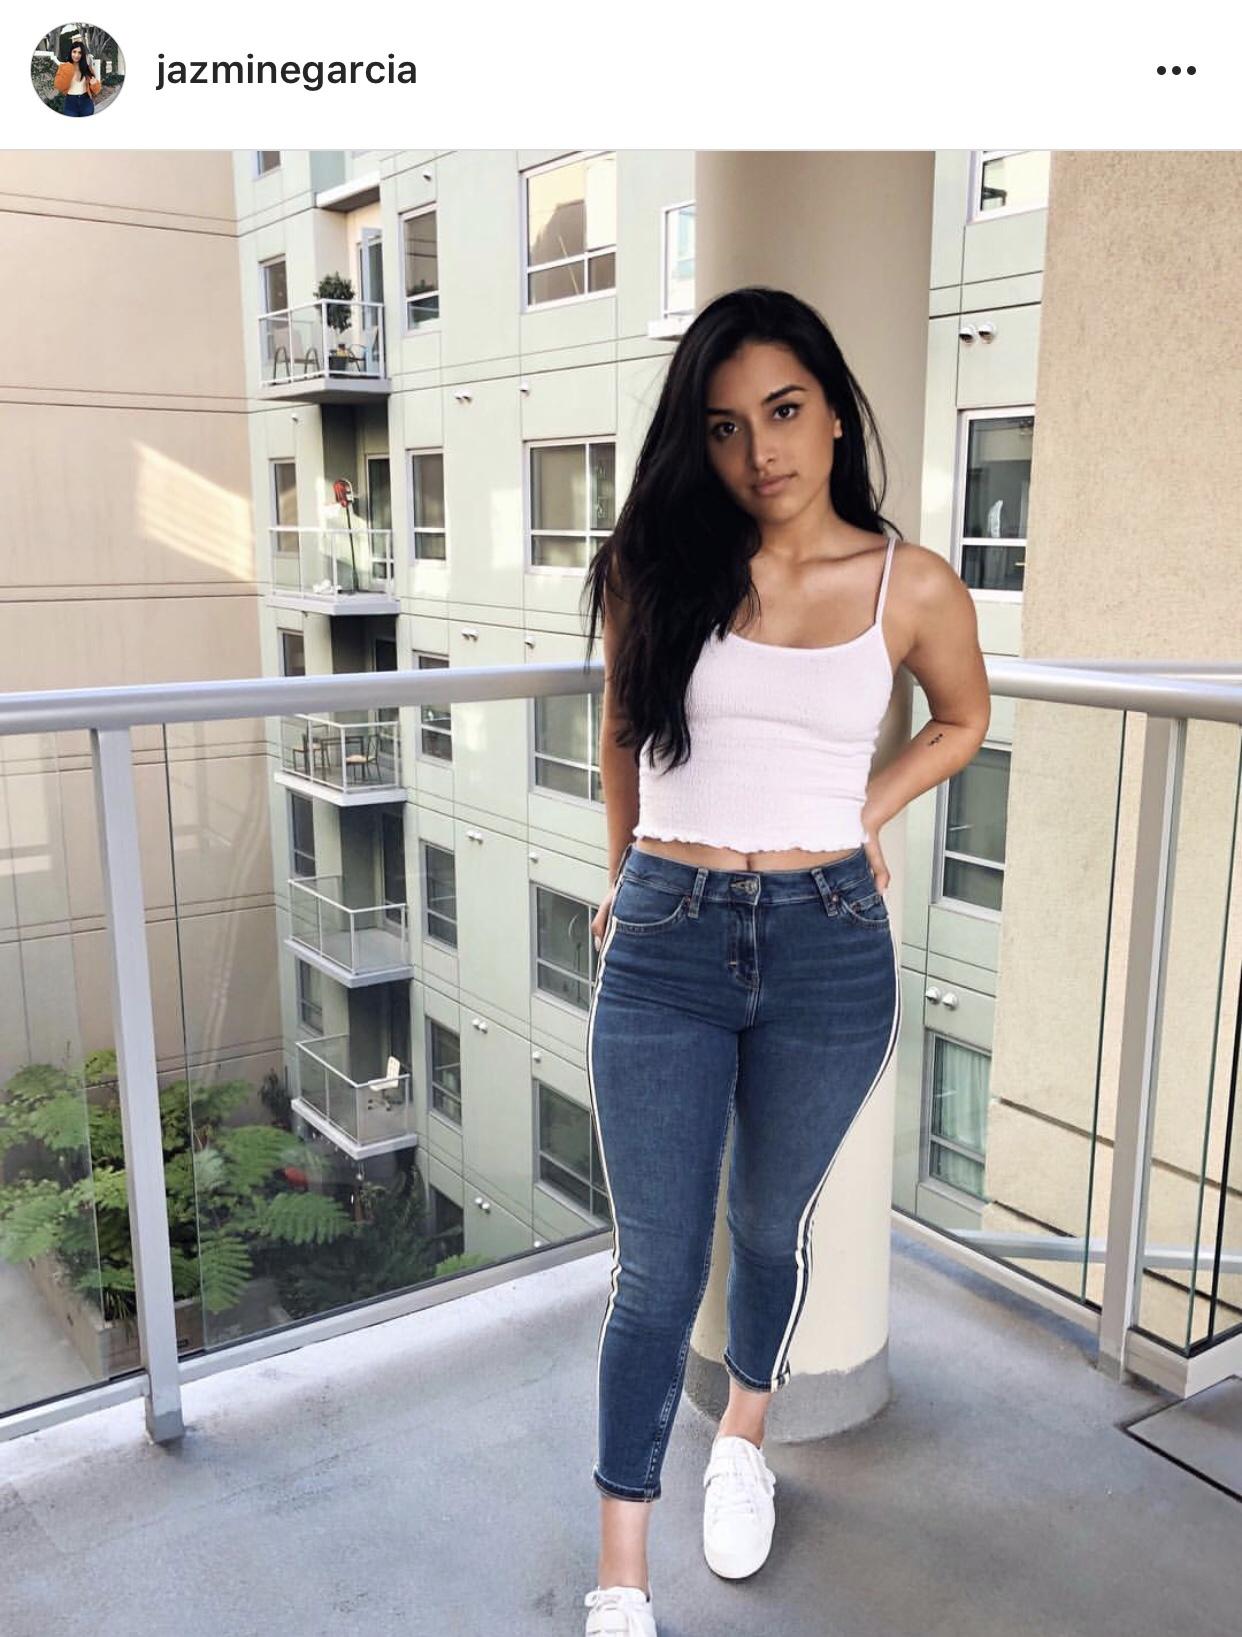 Selfie Jazmine Garcia nude photos 2019